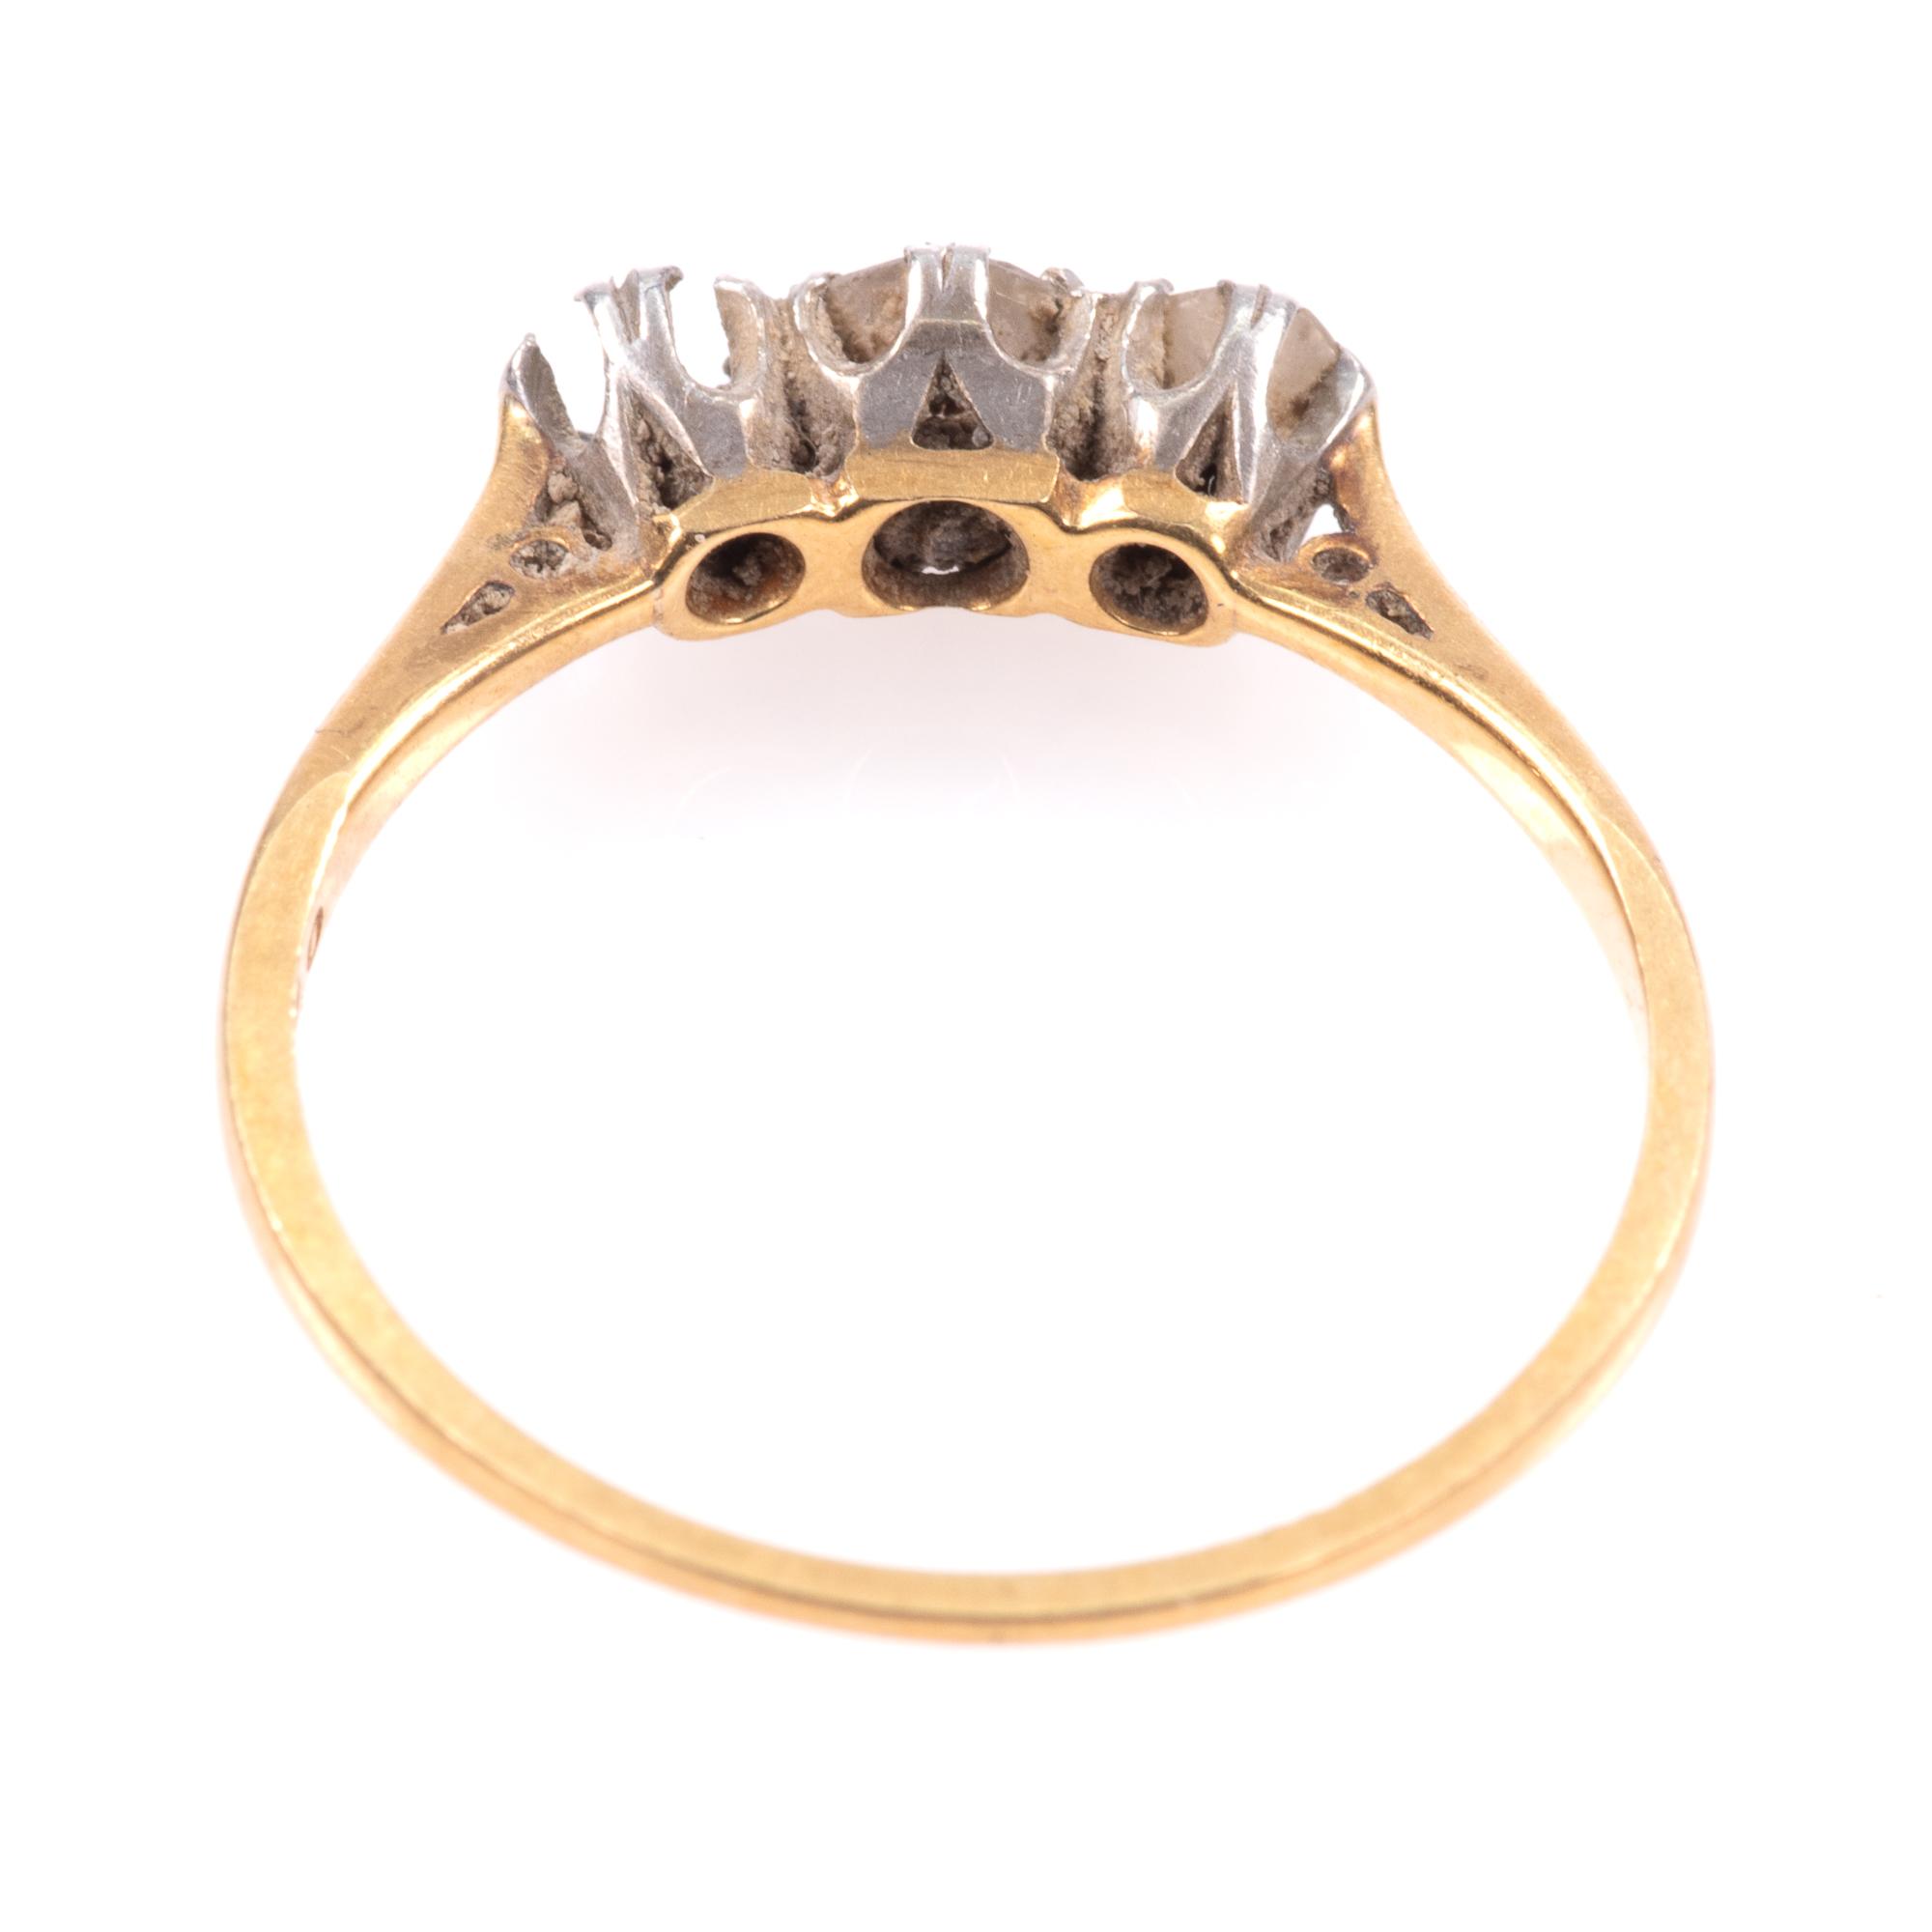 18ct Gold & Platinum 0.40ct Diamond Ring - Image 6 of 8